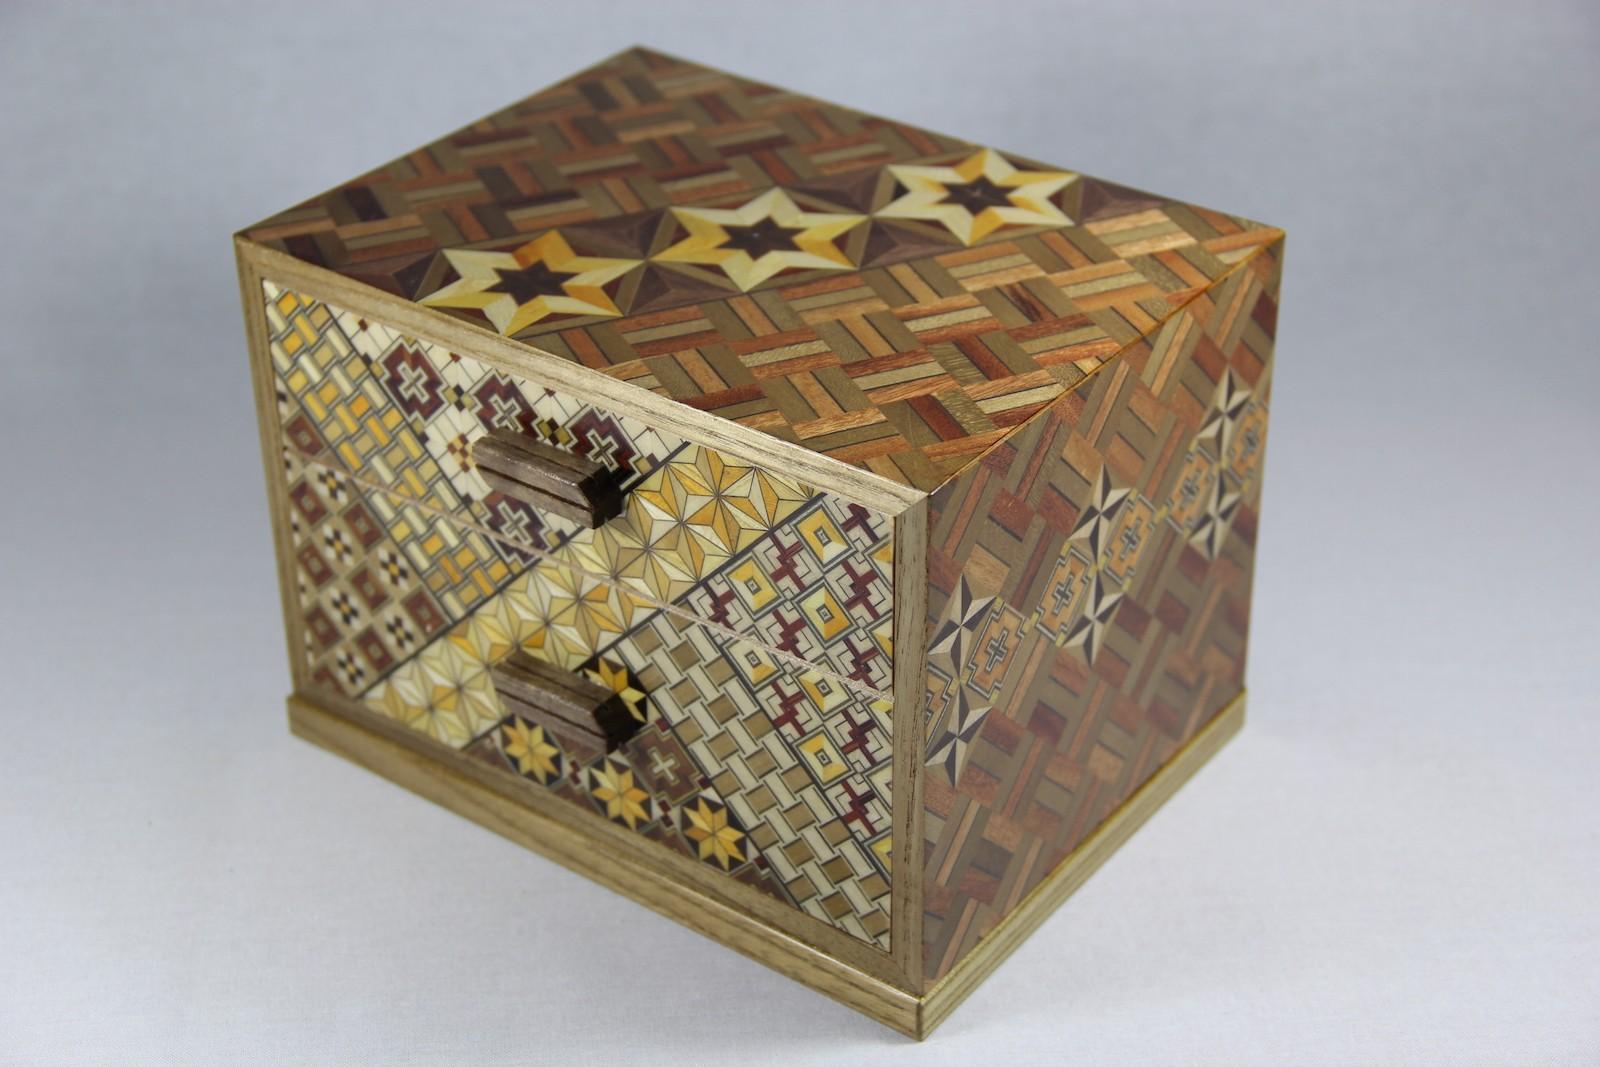 6 SUN 2 DRAWERS BOX KOYOSEGI